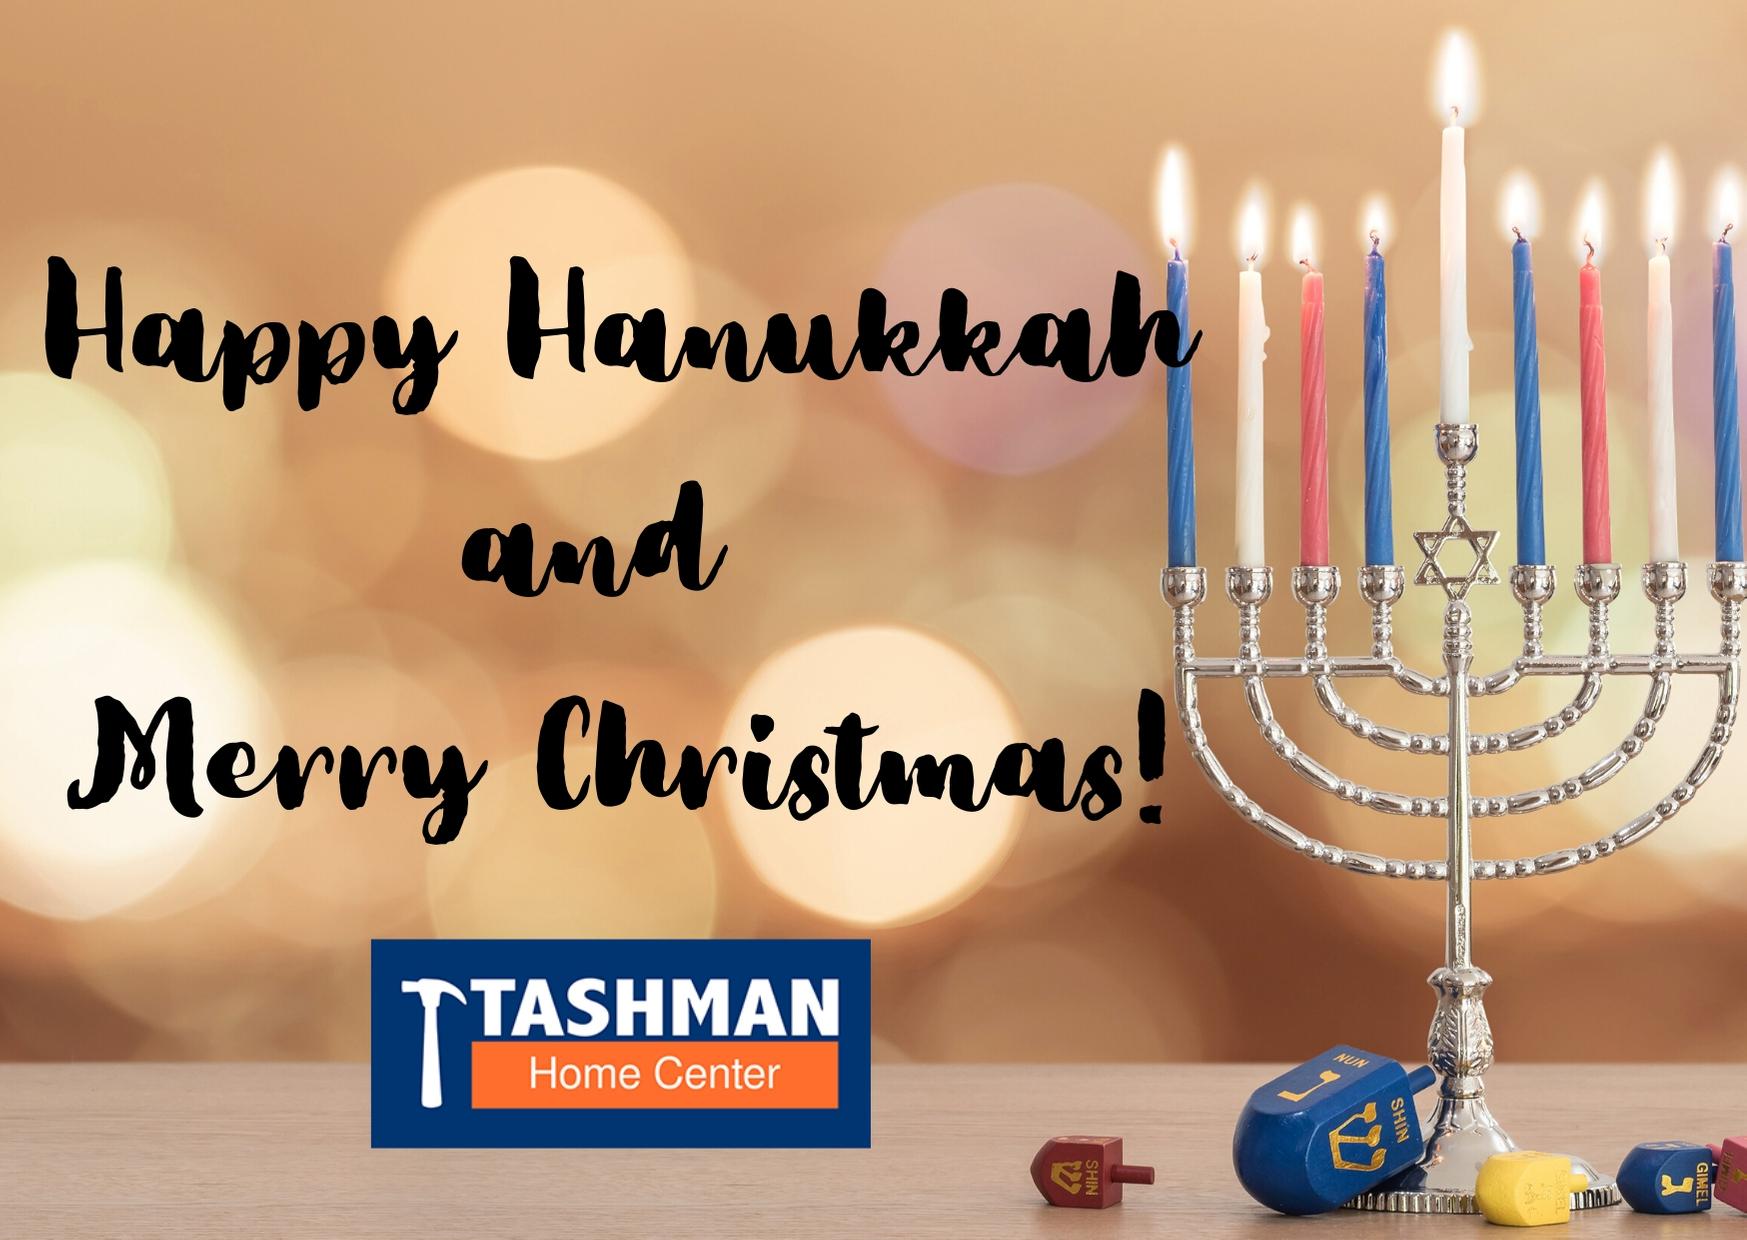 happy hanukkah and merry christmas